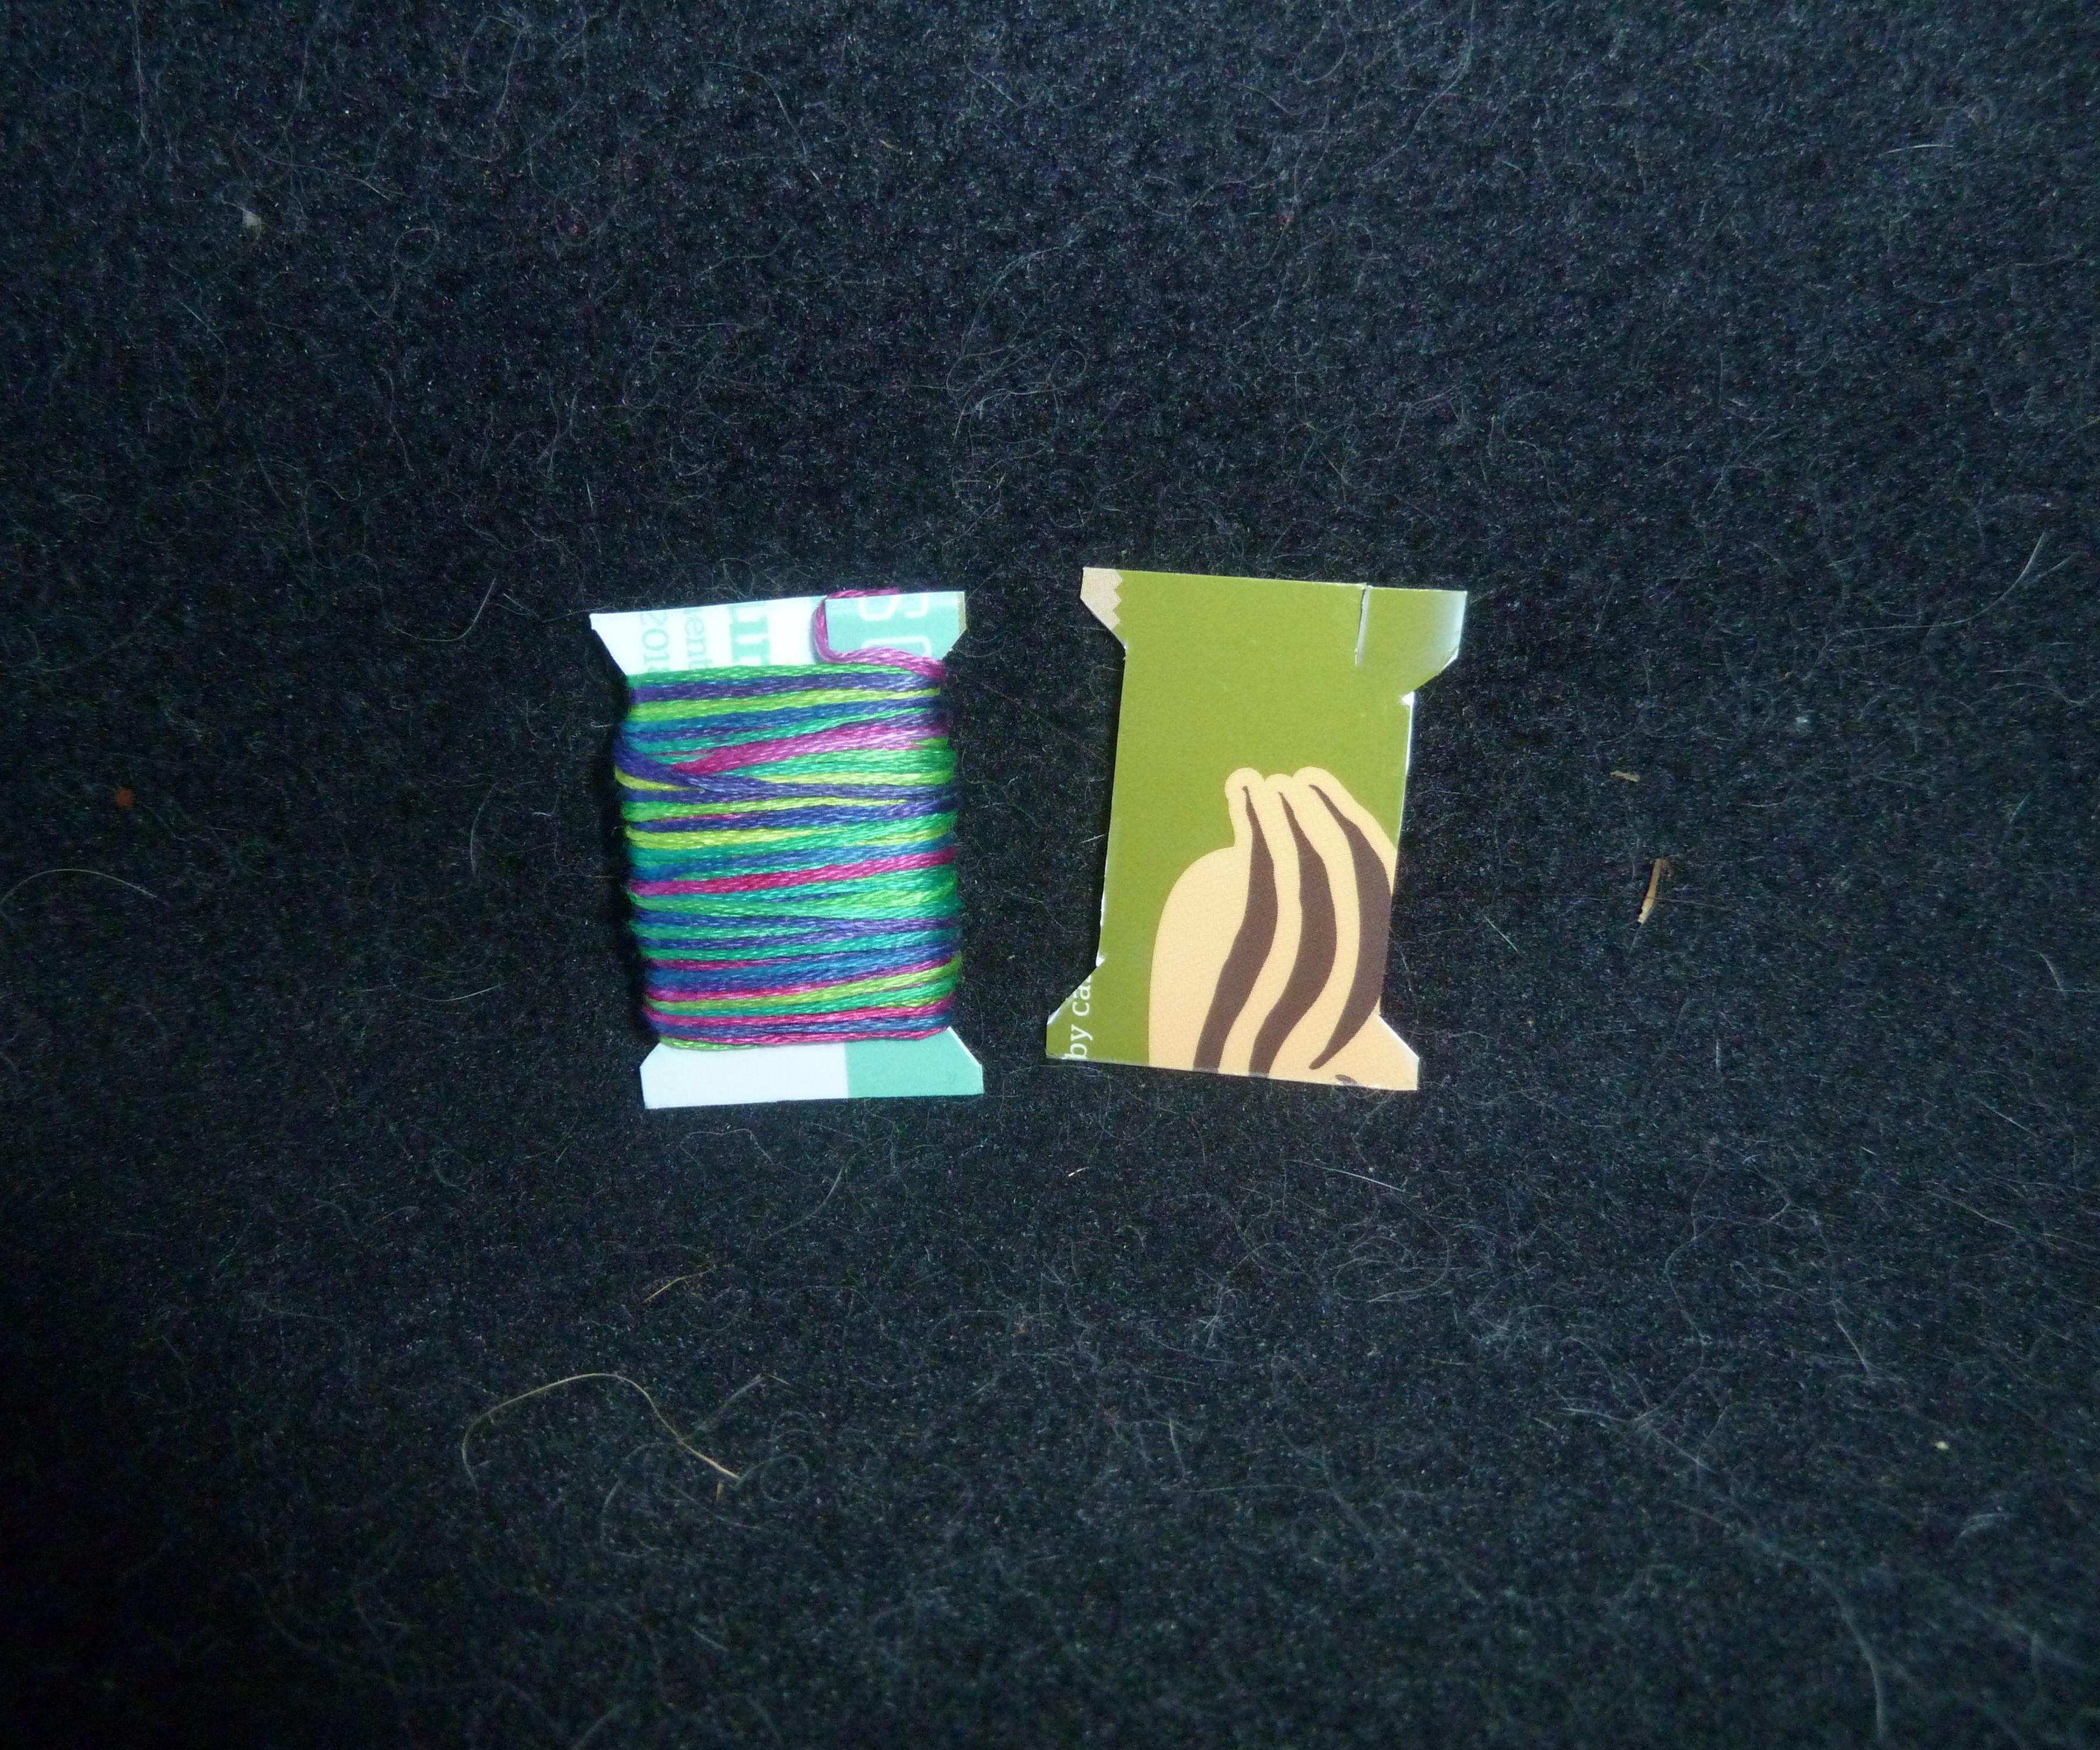 DIY Upcycled Embroidery Floss Bobbins